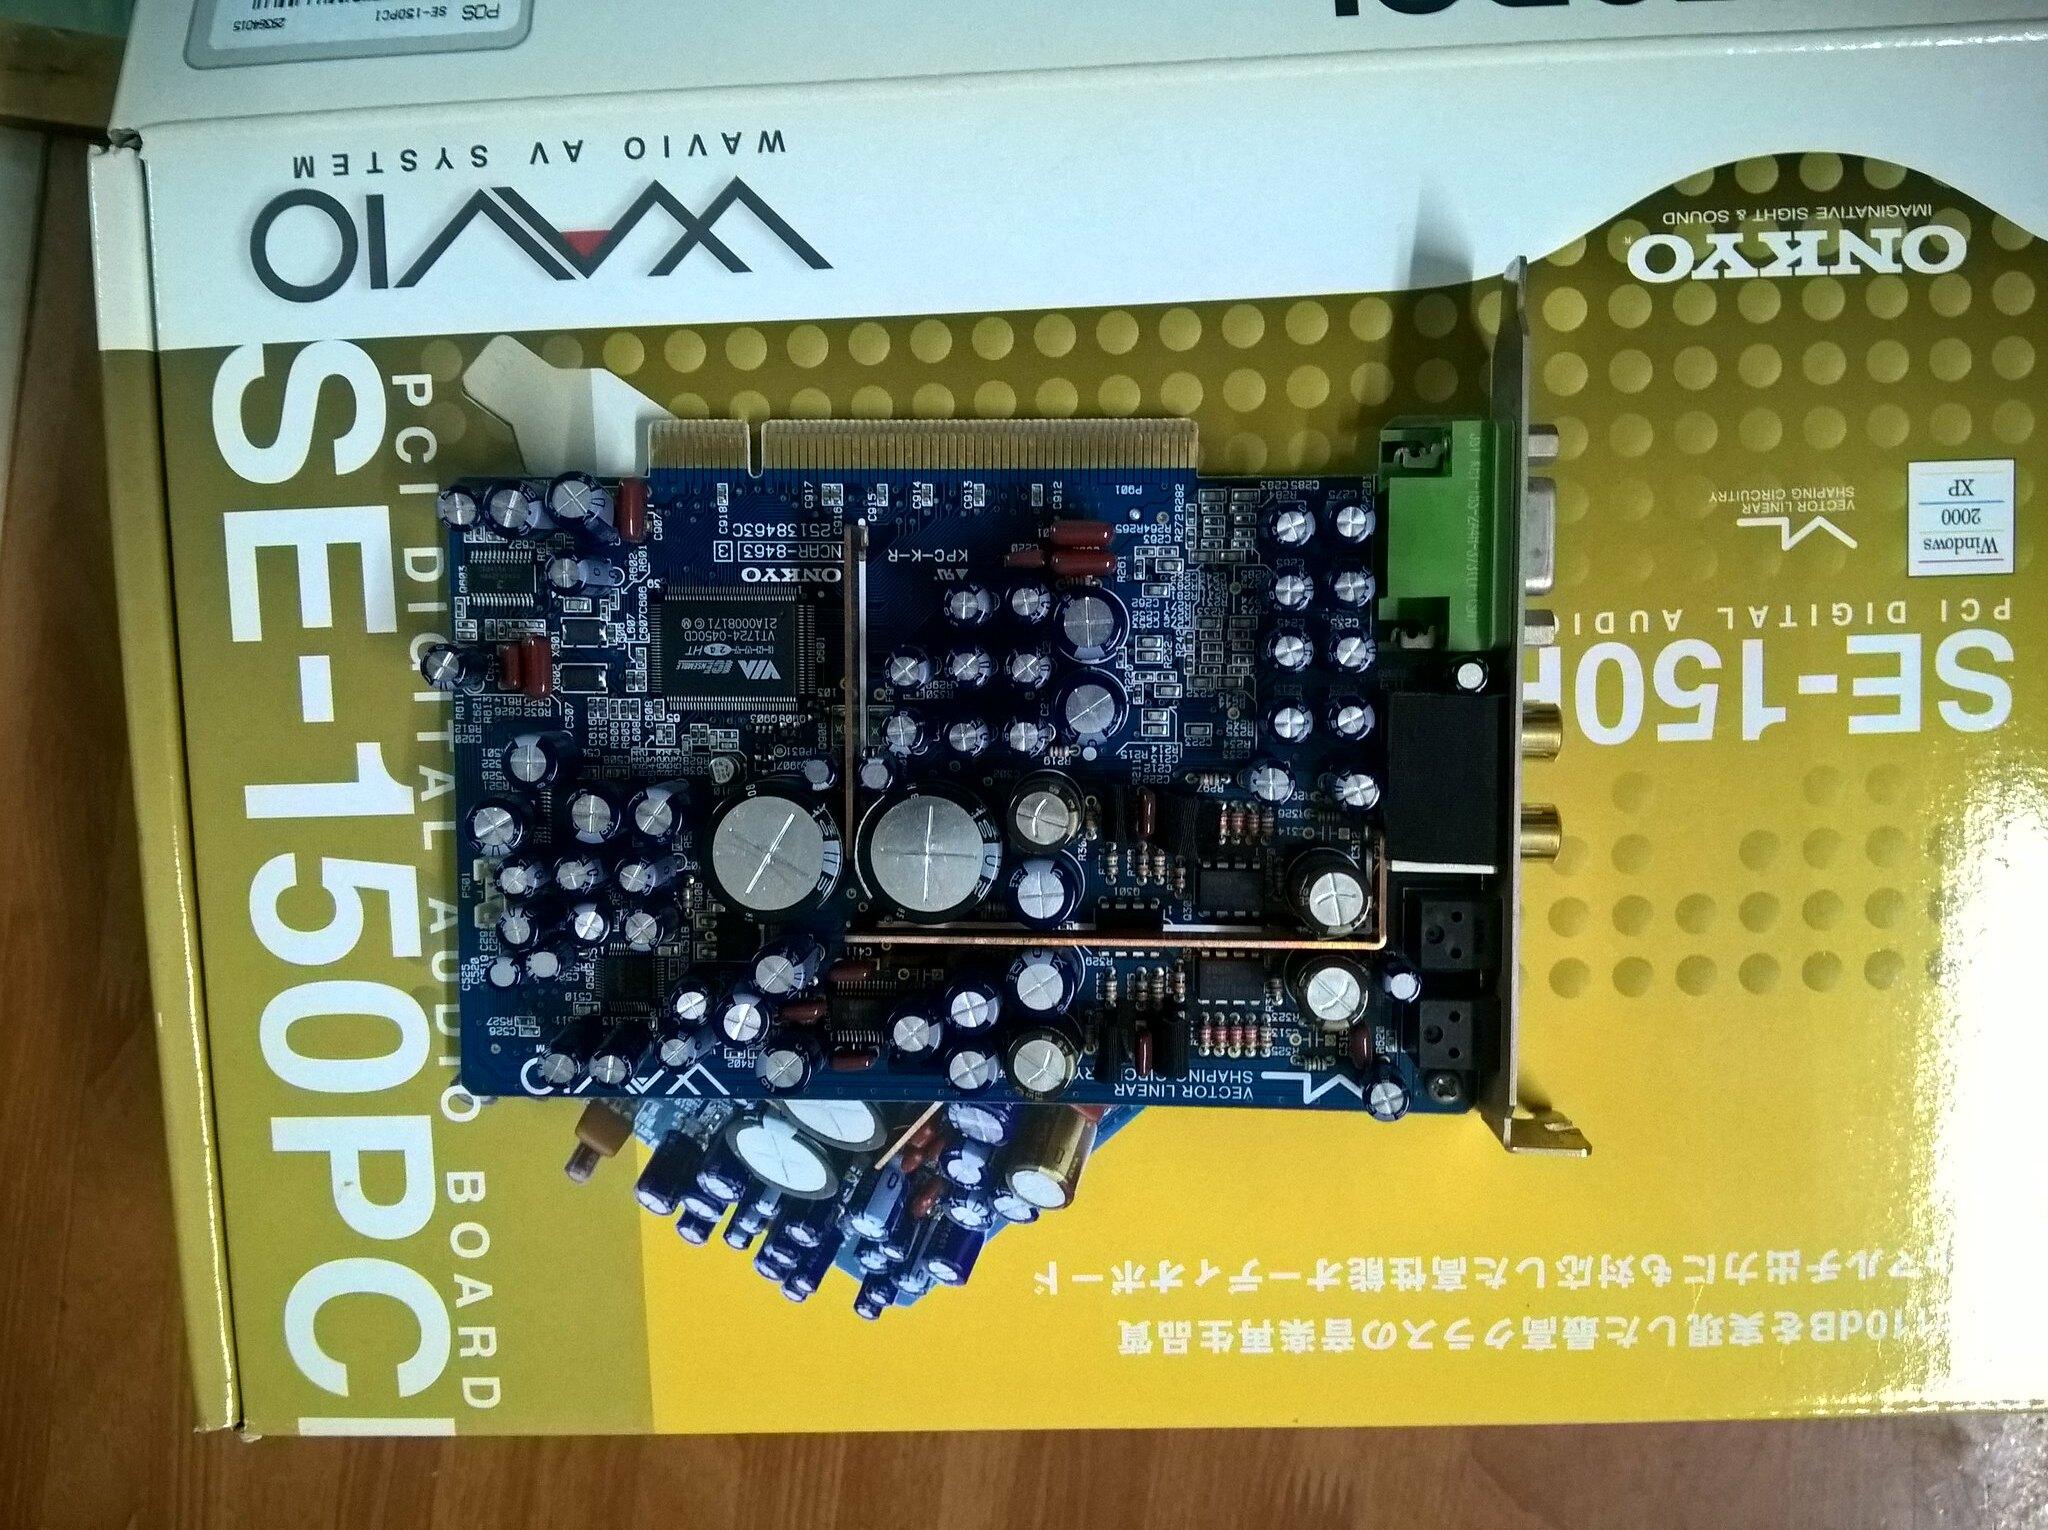 Onkyo từ Japan - U55SX, U55SX2, 200PCI LTD, 200PCI, 150PCI, 90PCI - 10